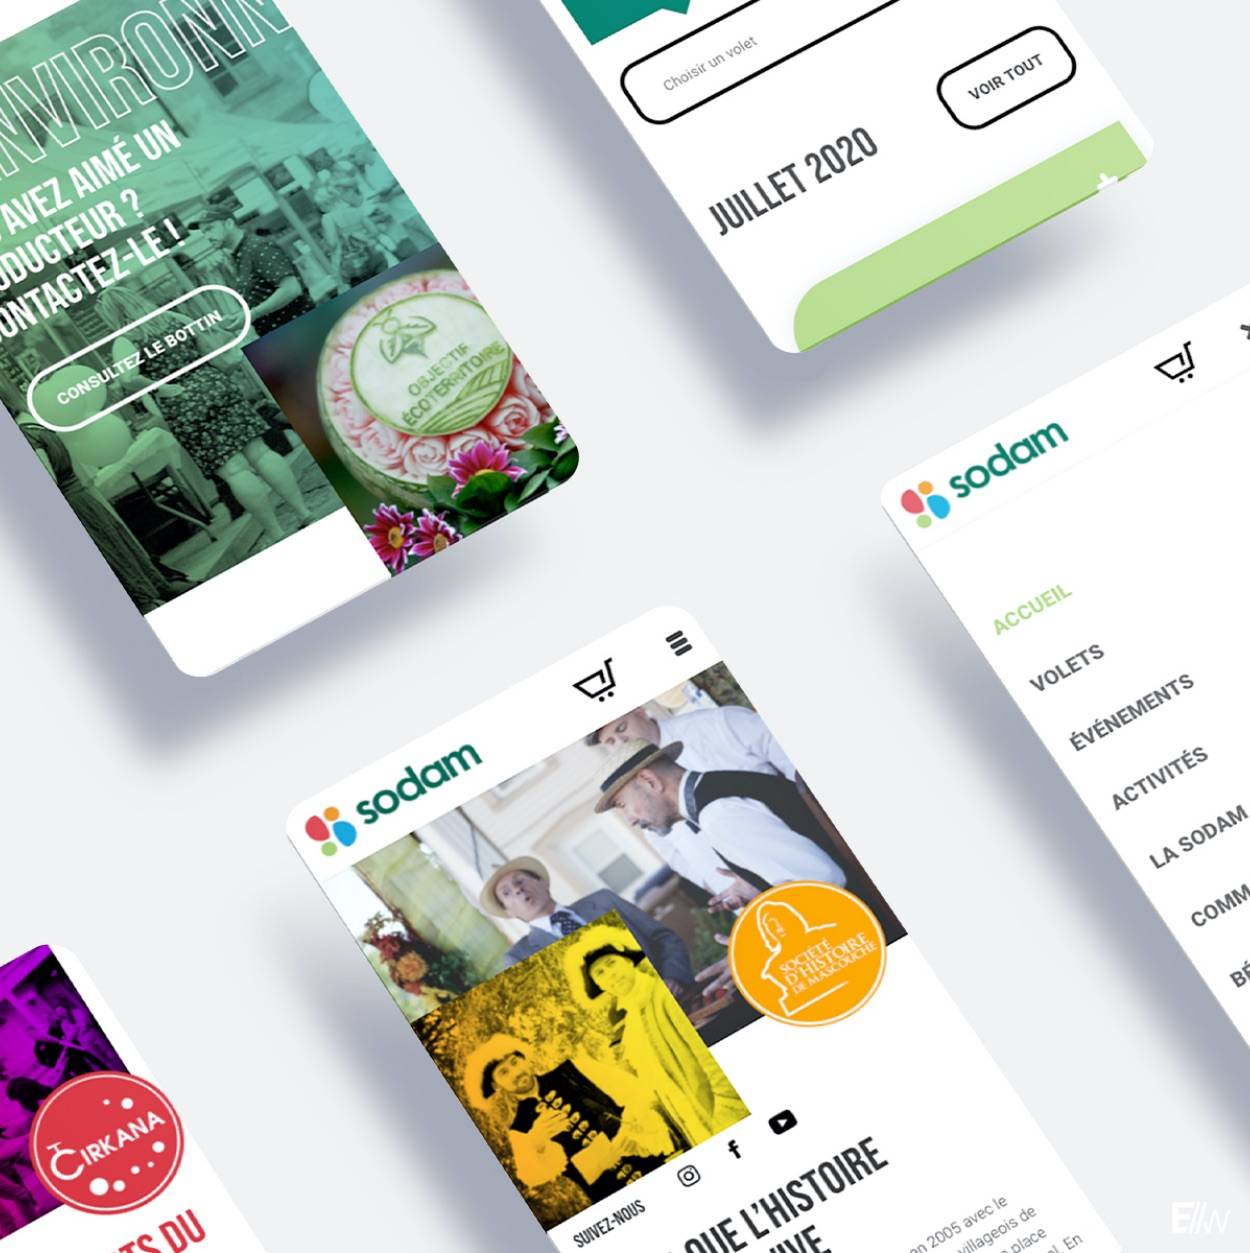 Image adaptative | Site Web mobile | Stratégie responsive